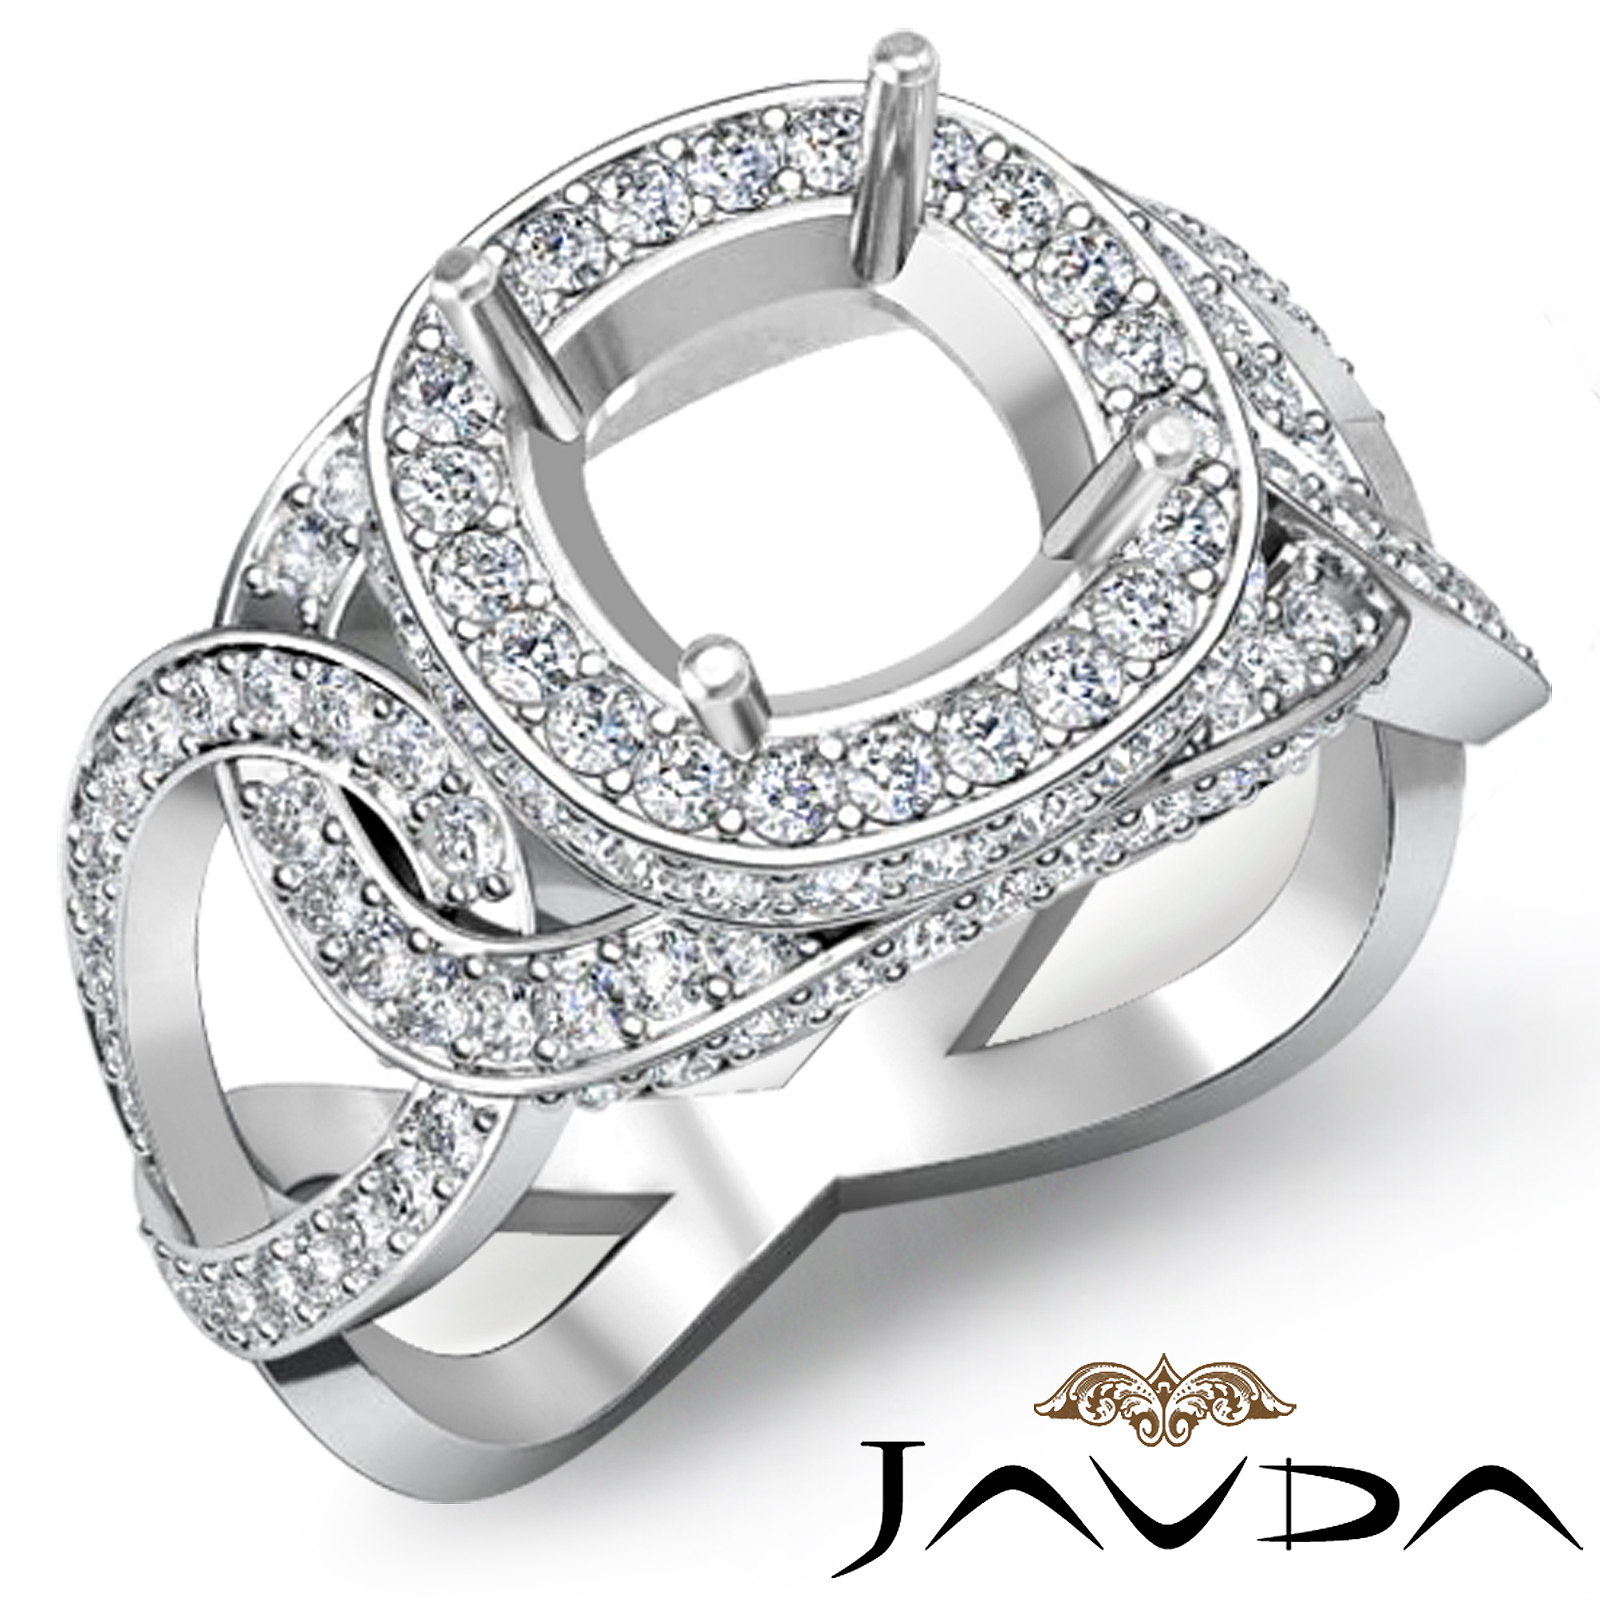 1.8ct Round Antique Diamond Engagement Ring Setting Wg